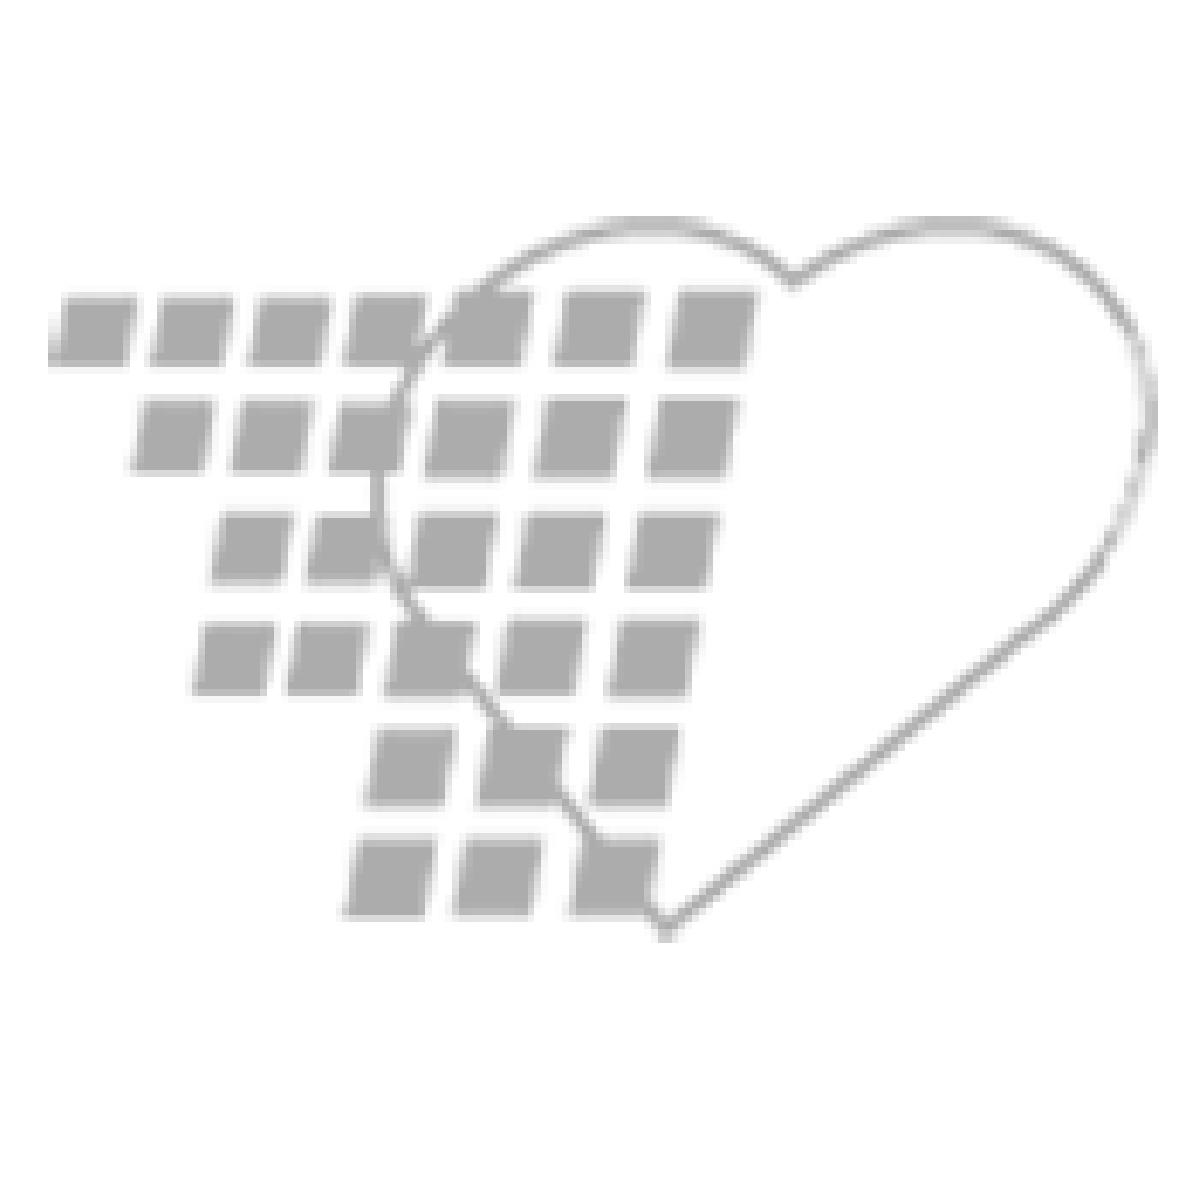 03-75-150 - Isolation Gown Standard Polyethylene Thumb Loop